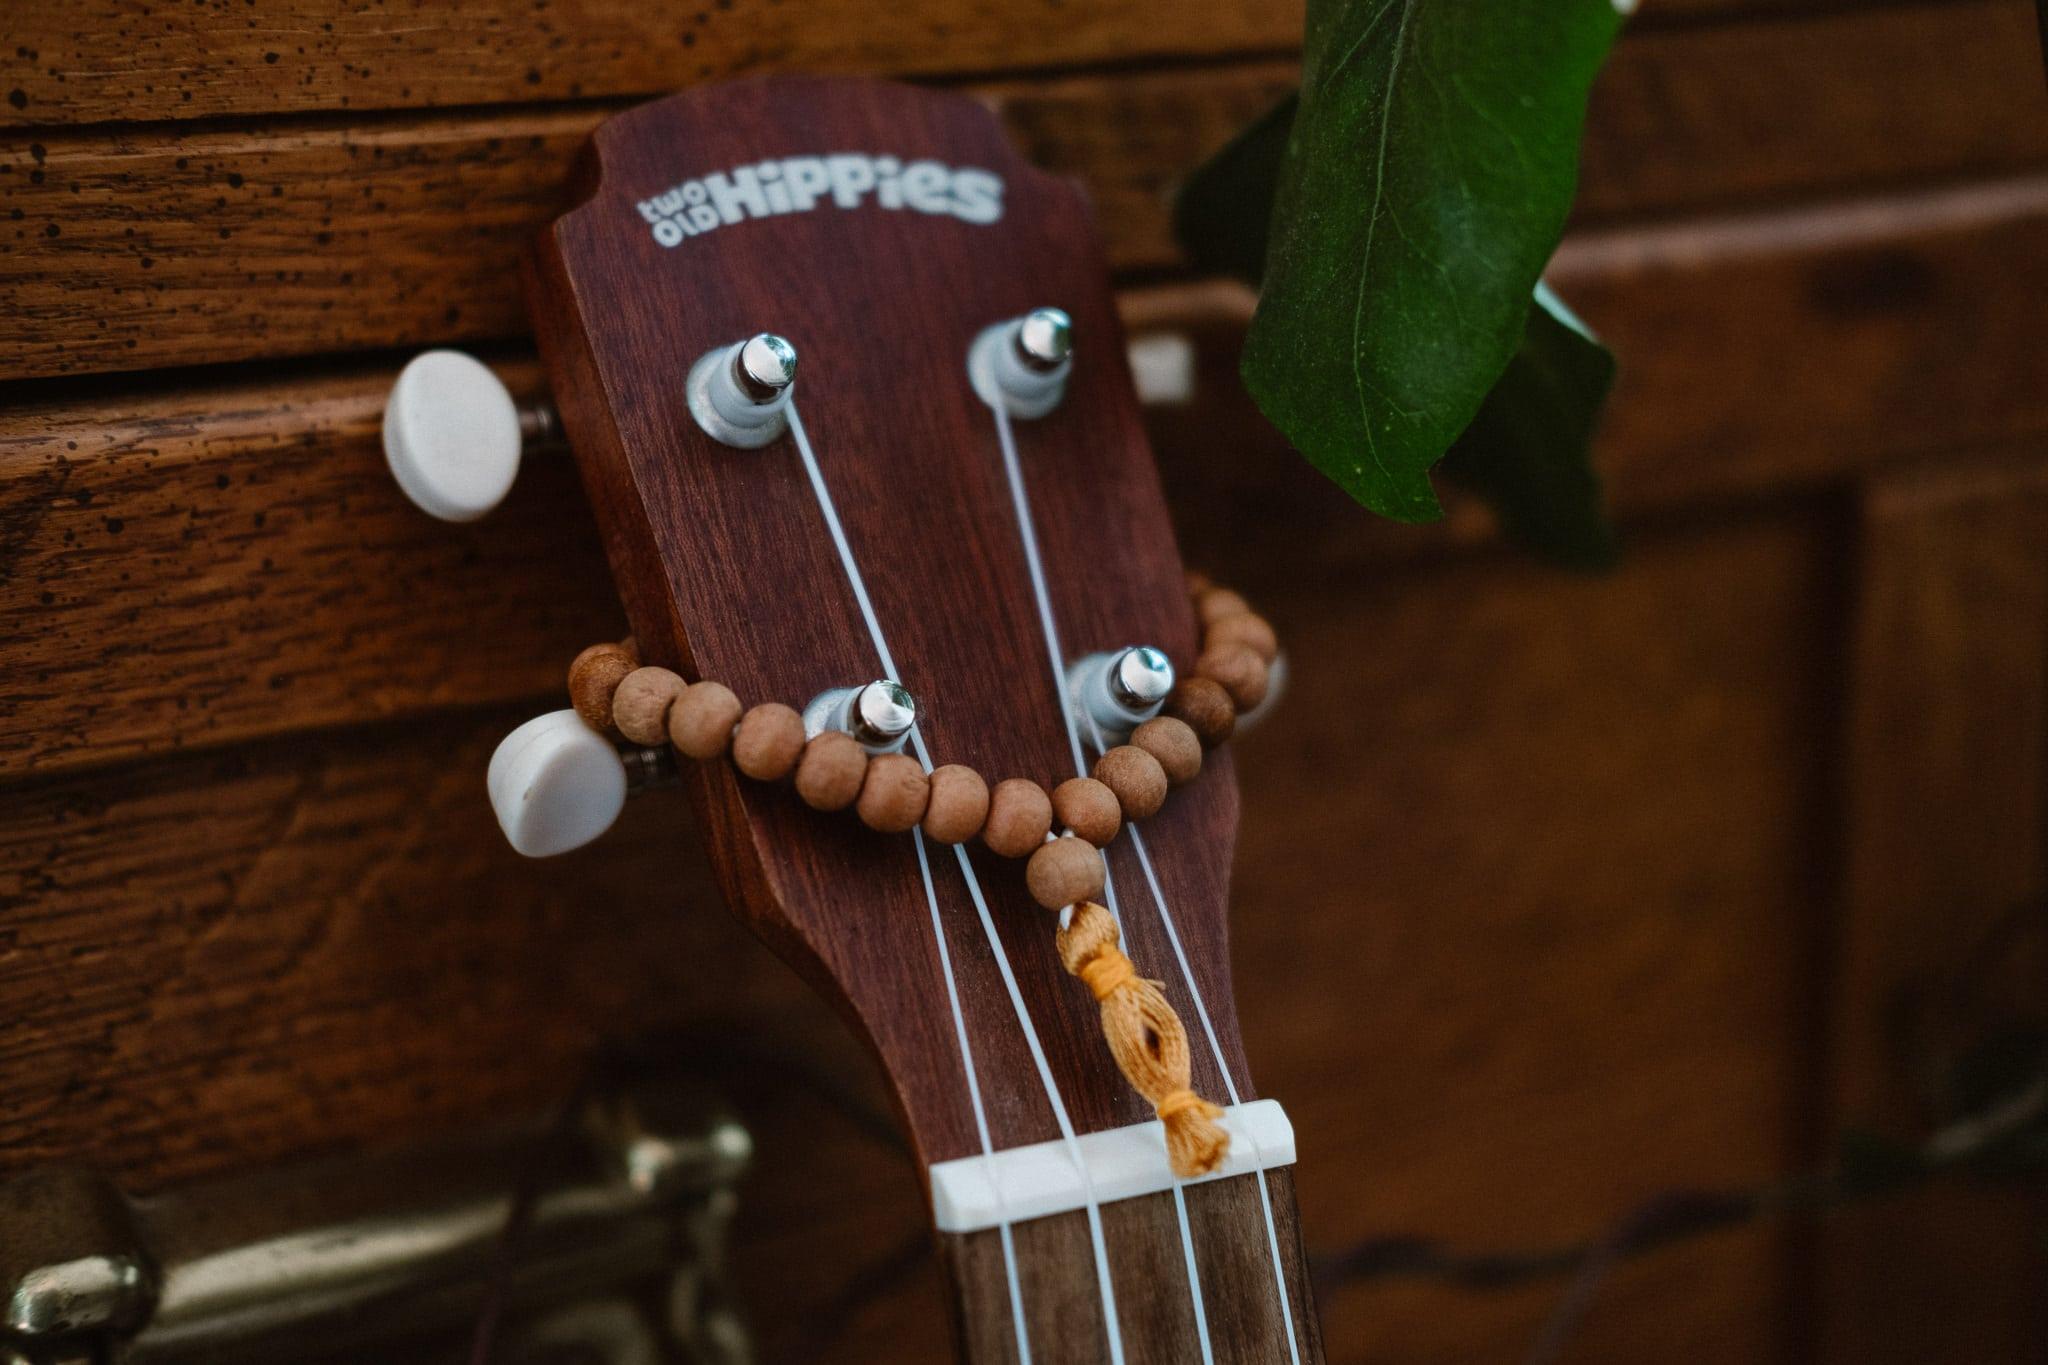 Mala beads on guitar